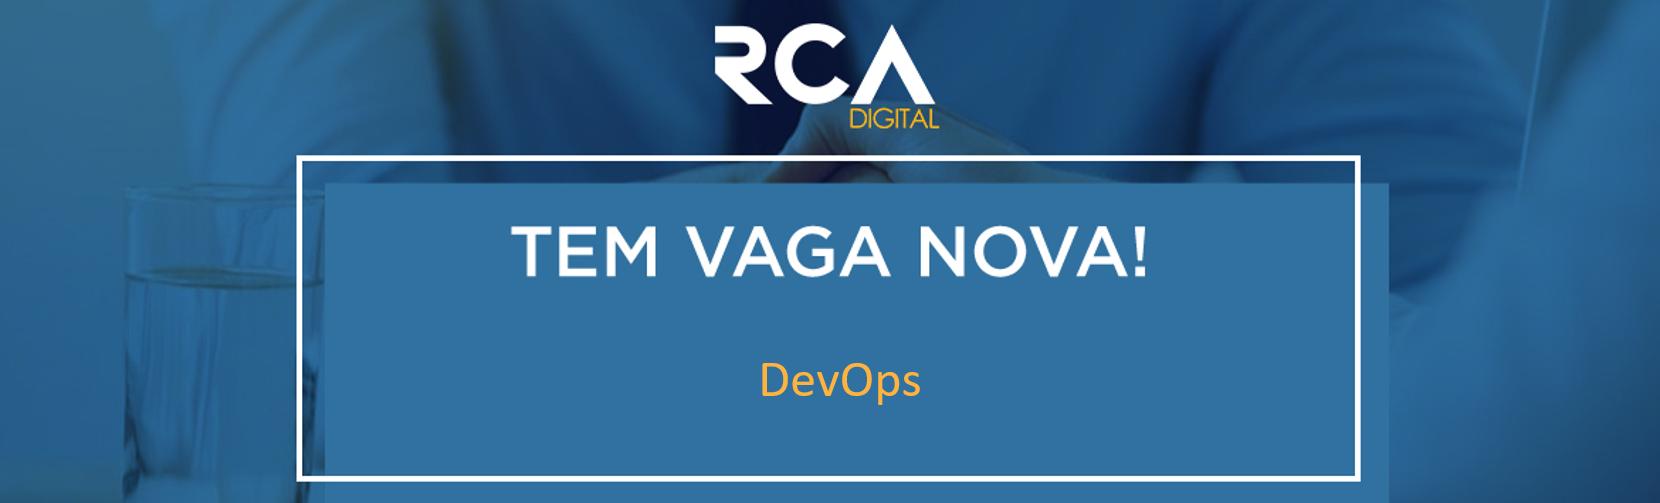 [RCA] - DevOps